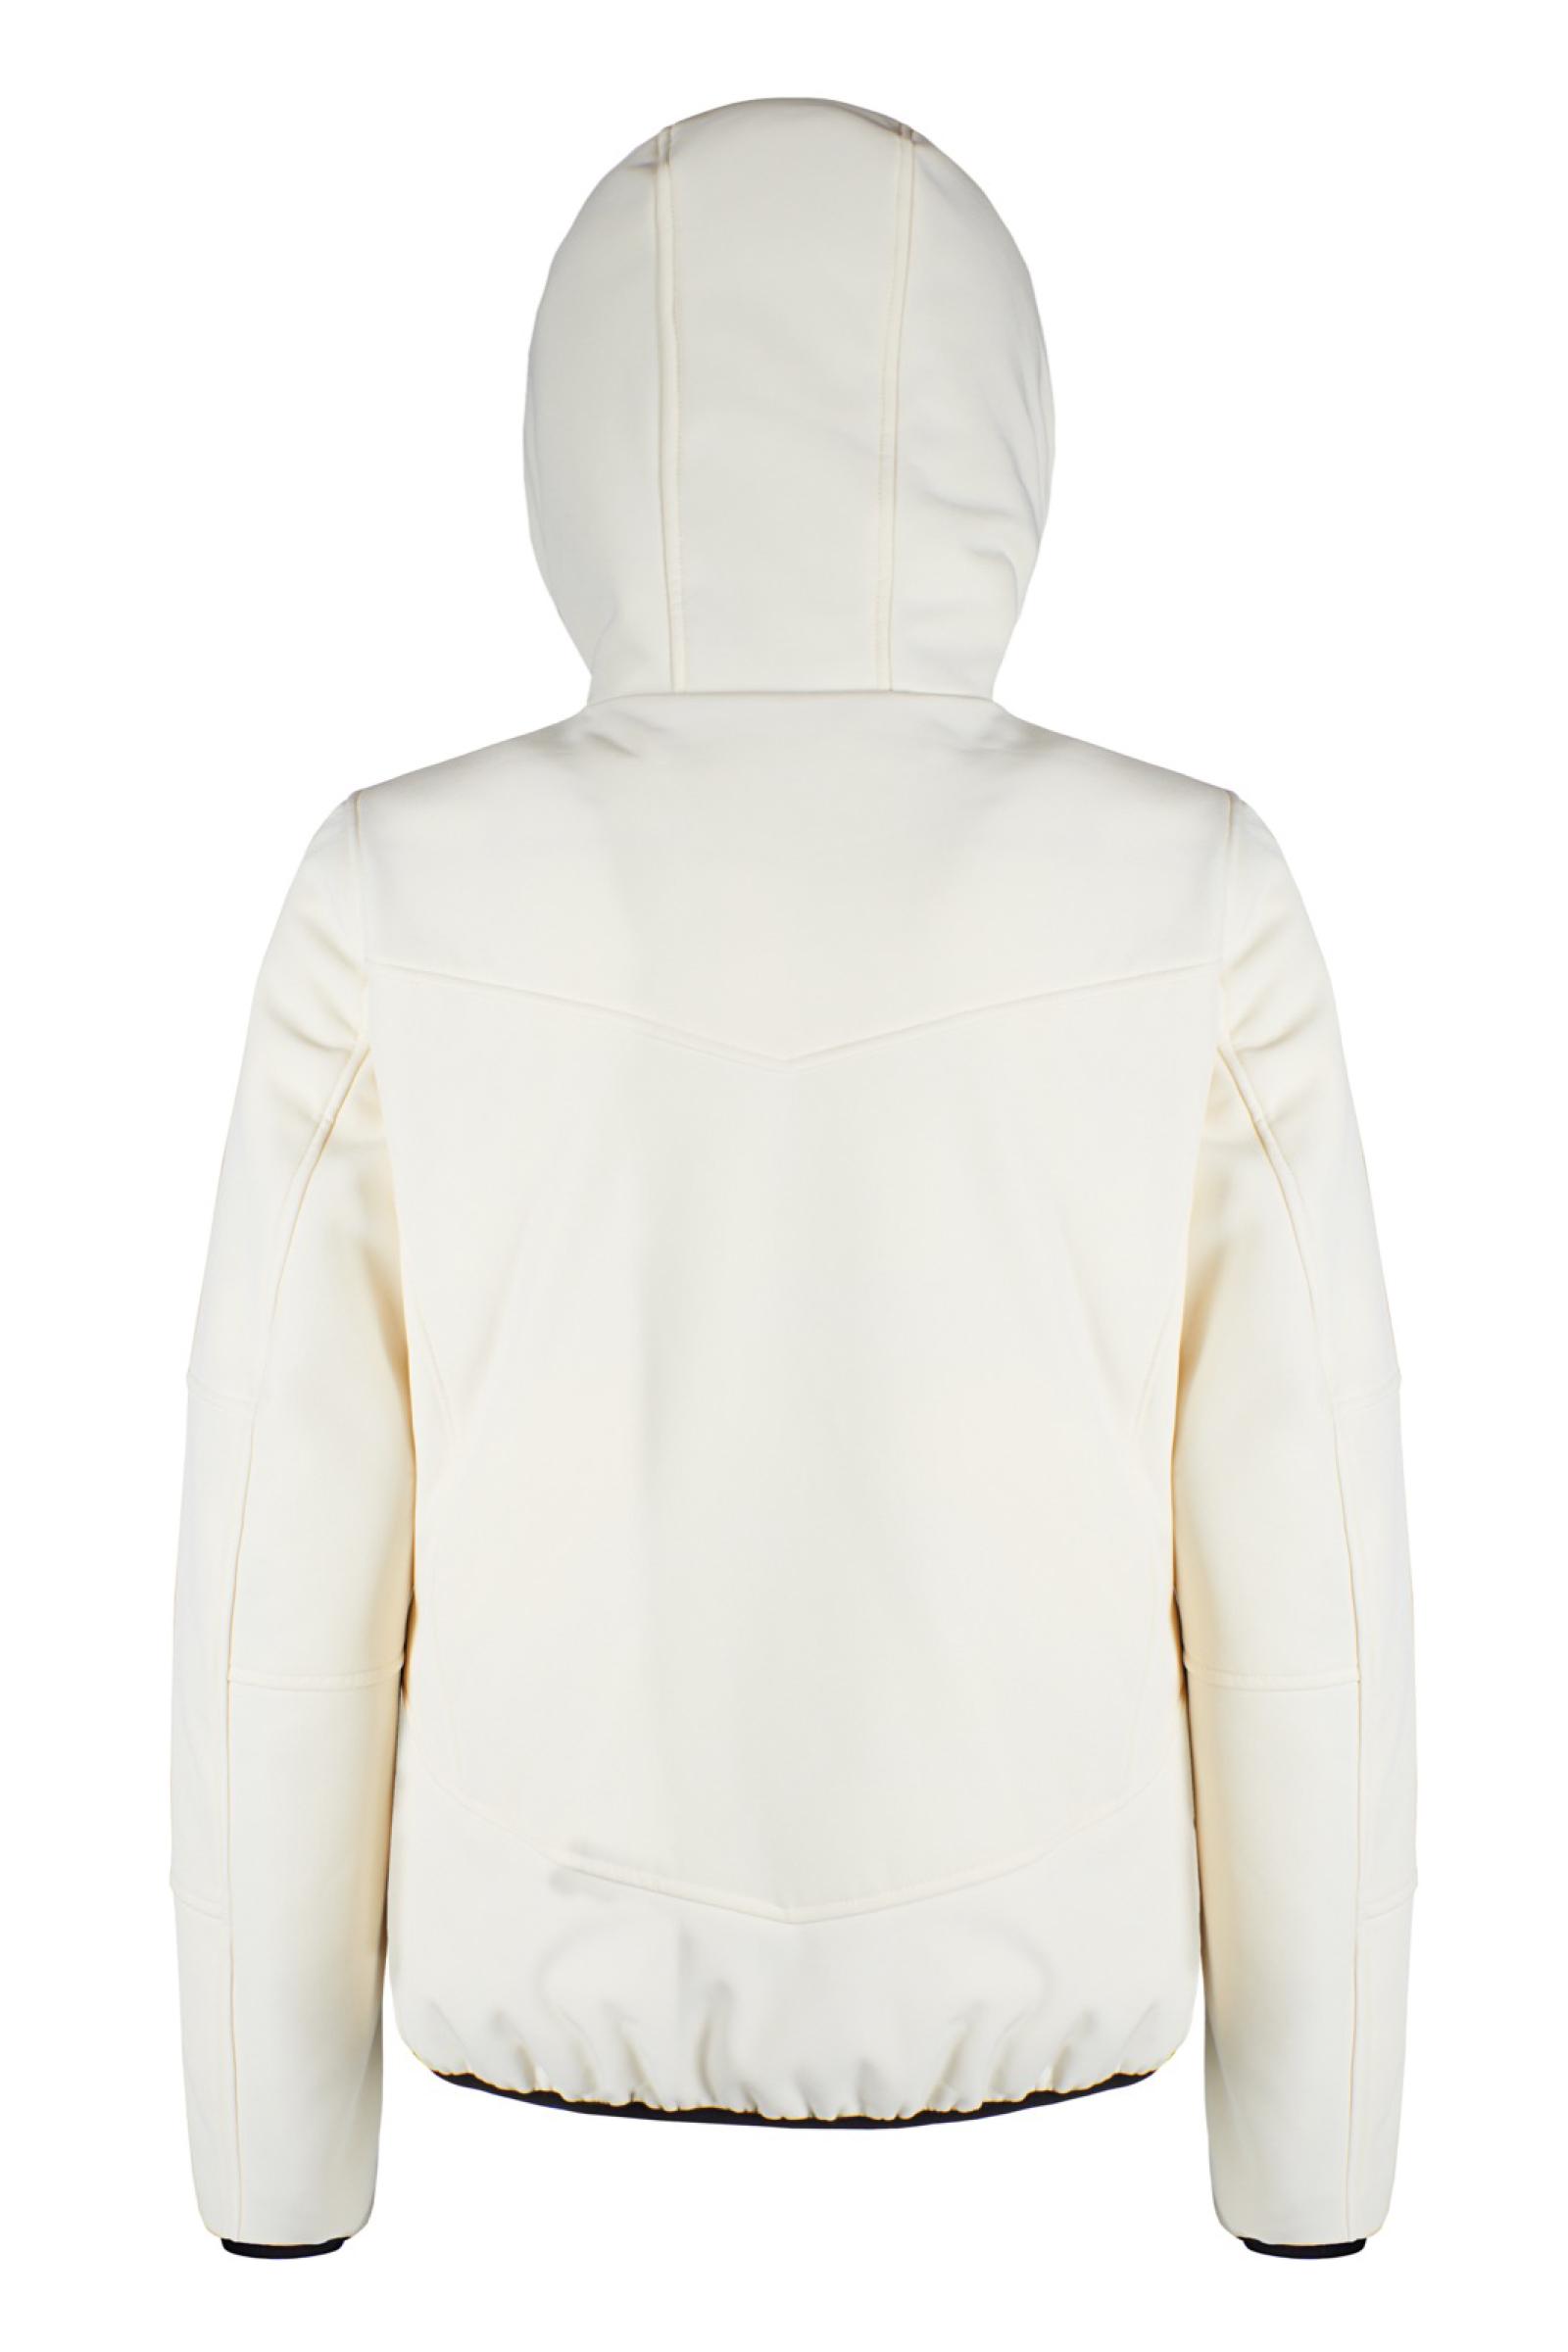 YES ZEE Men's Jacket YES.ZEE   Jacket   J854 QB000128